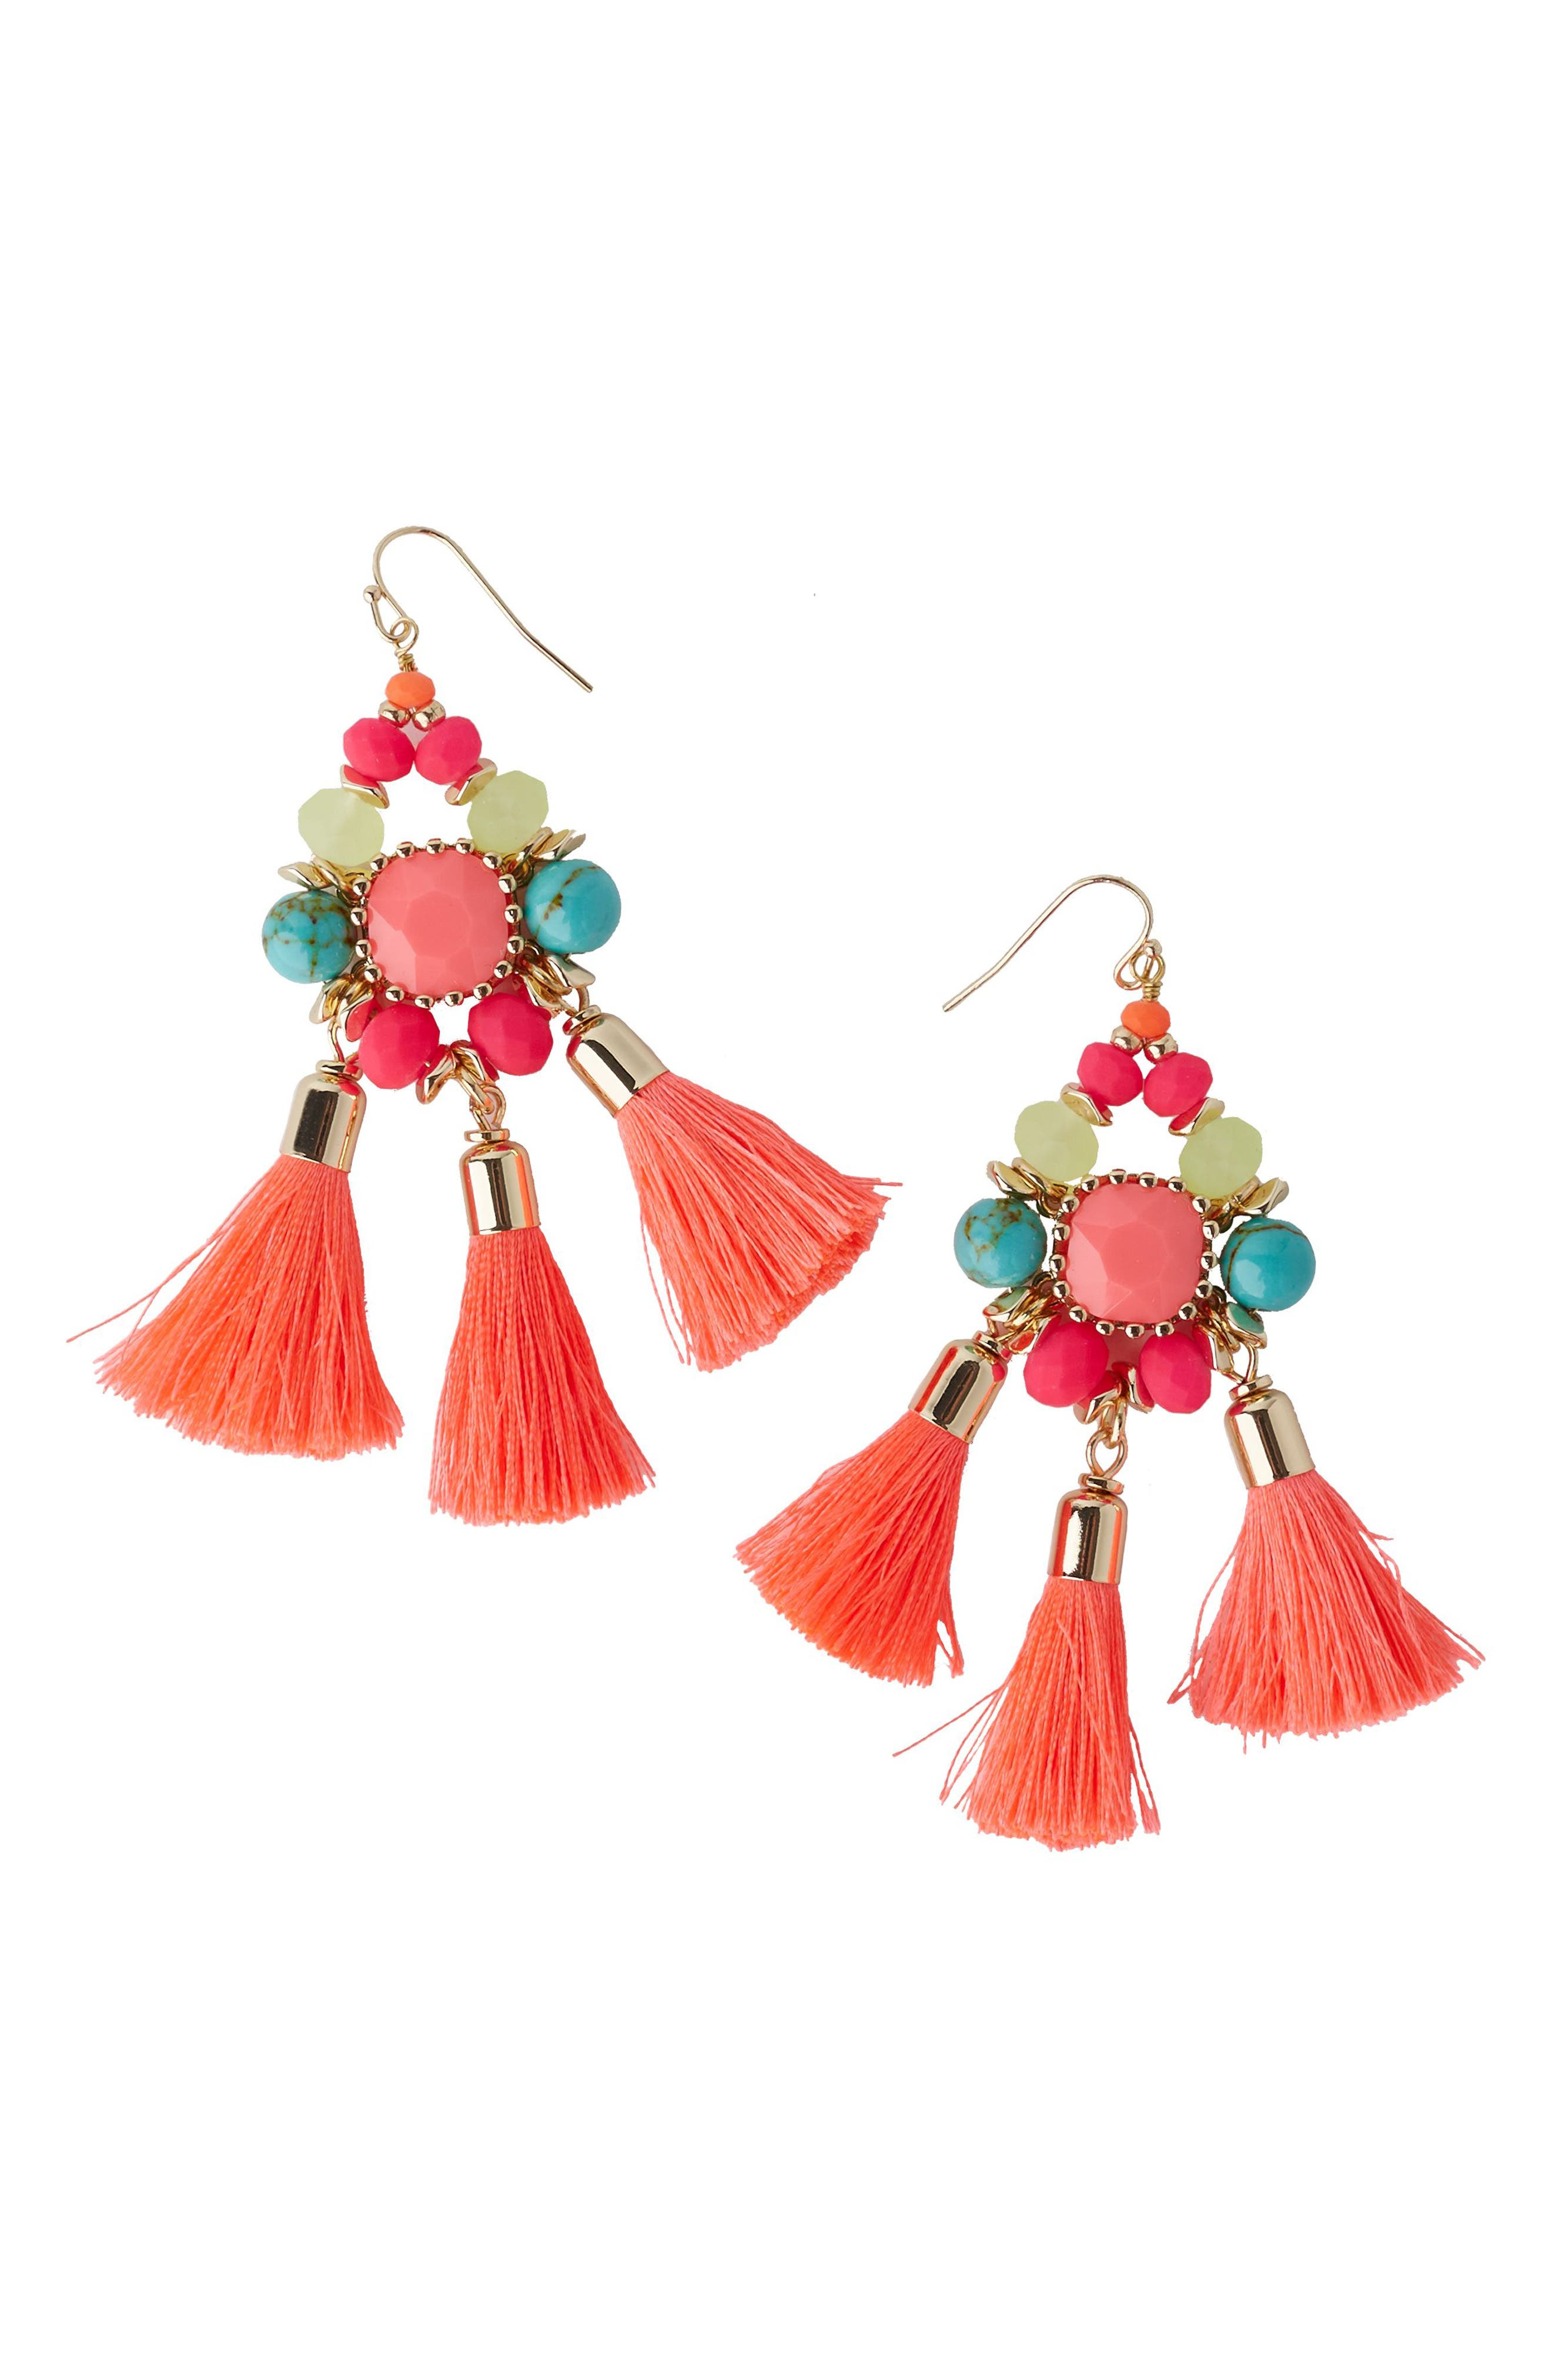 Boho Beach Drop Earrings,                             Main thumbnail 1, color,                             Multi